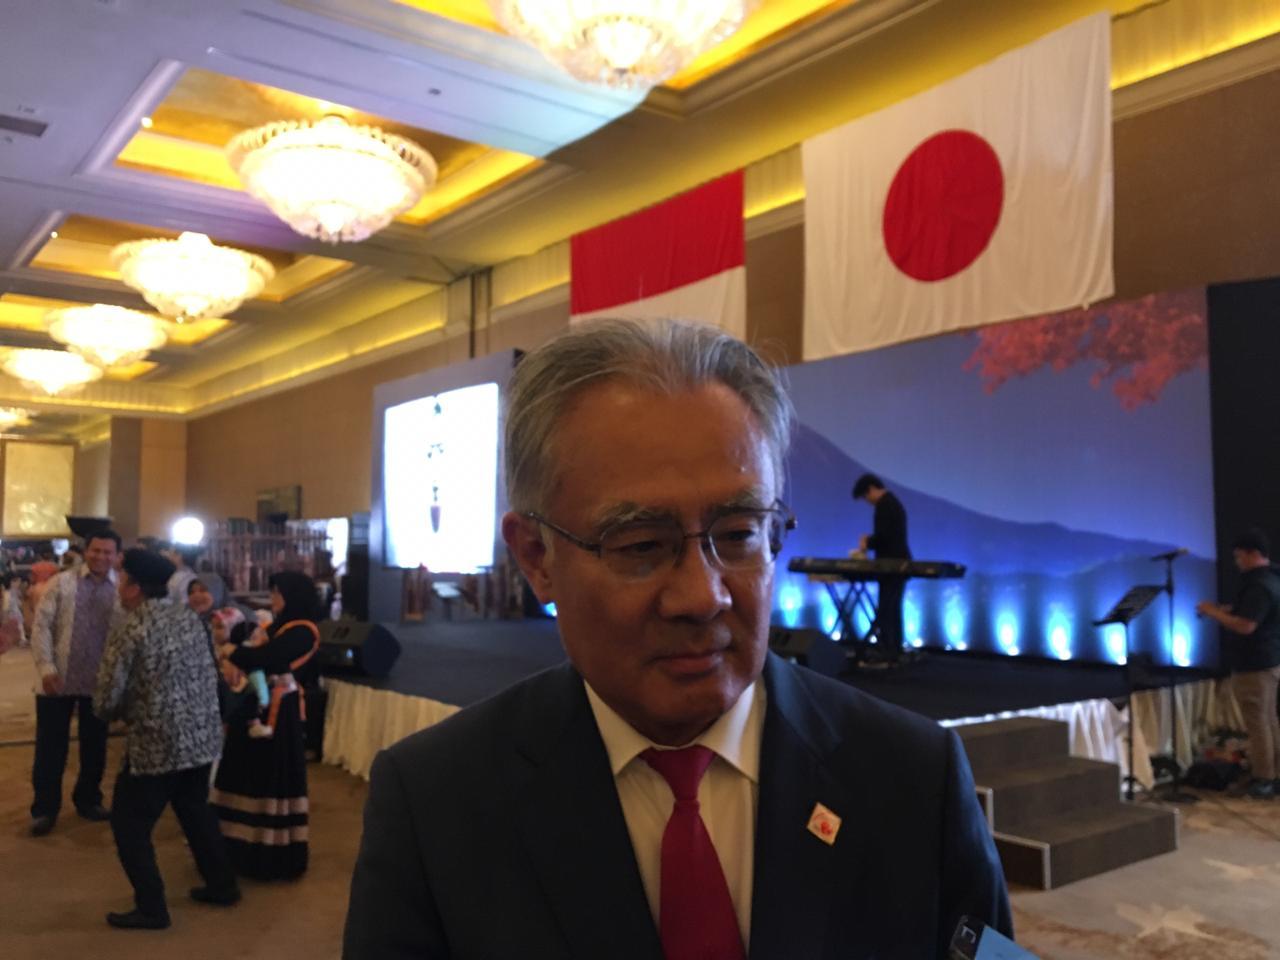 Jepang Terus Bantu Pembangunan Sulawesi Tengah